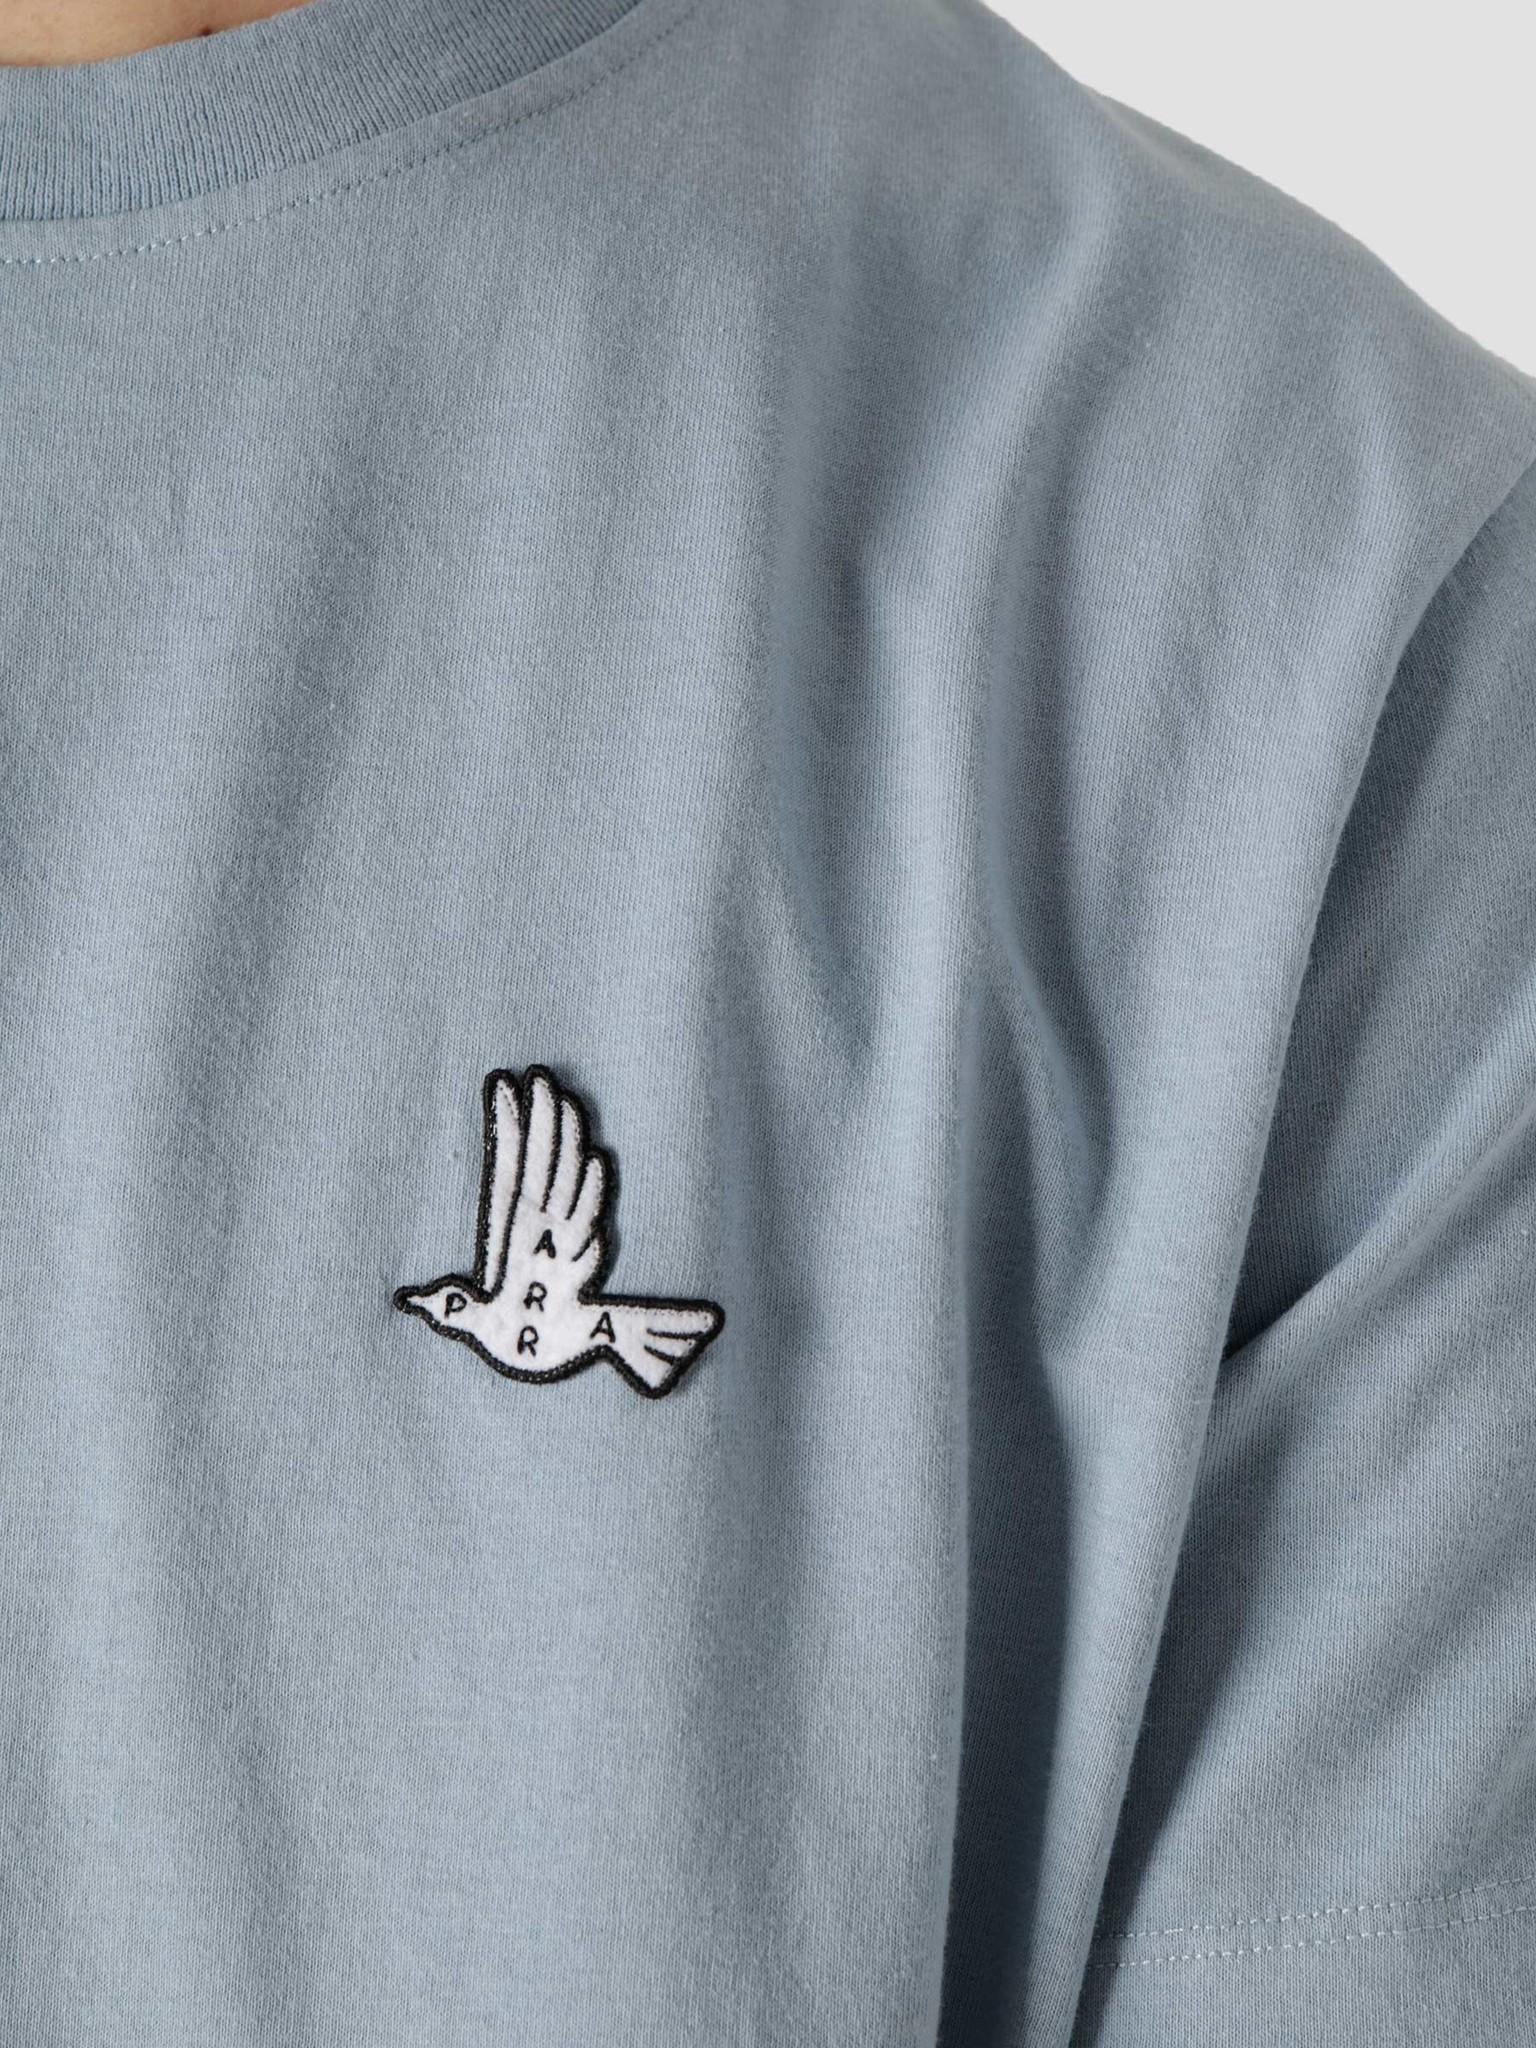 by Parra by Parra Mother Nature T-Shirt Dusty Blue 45440